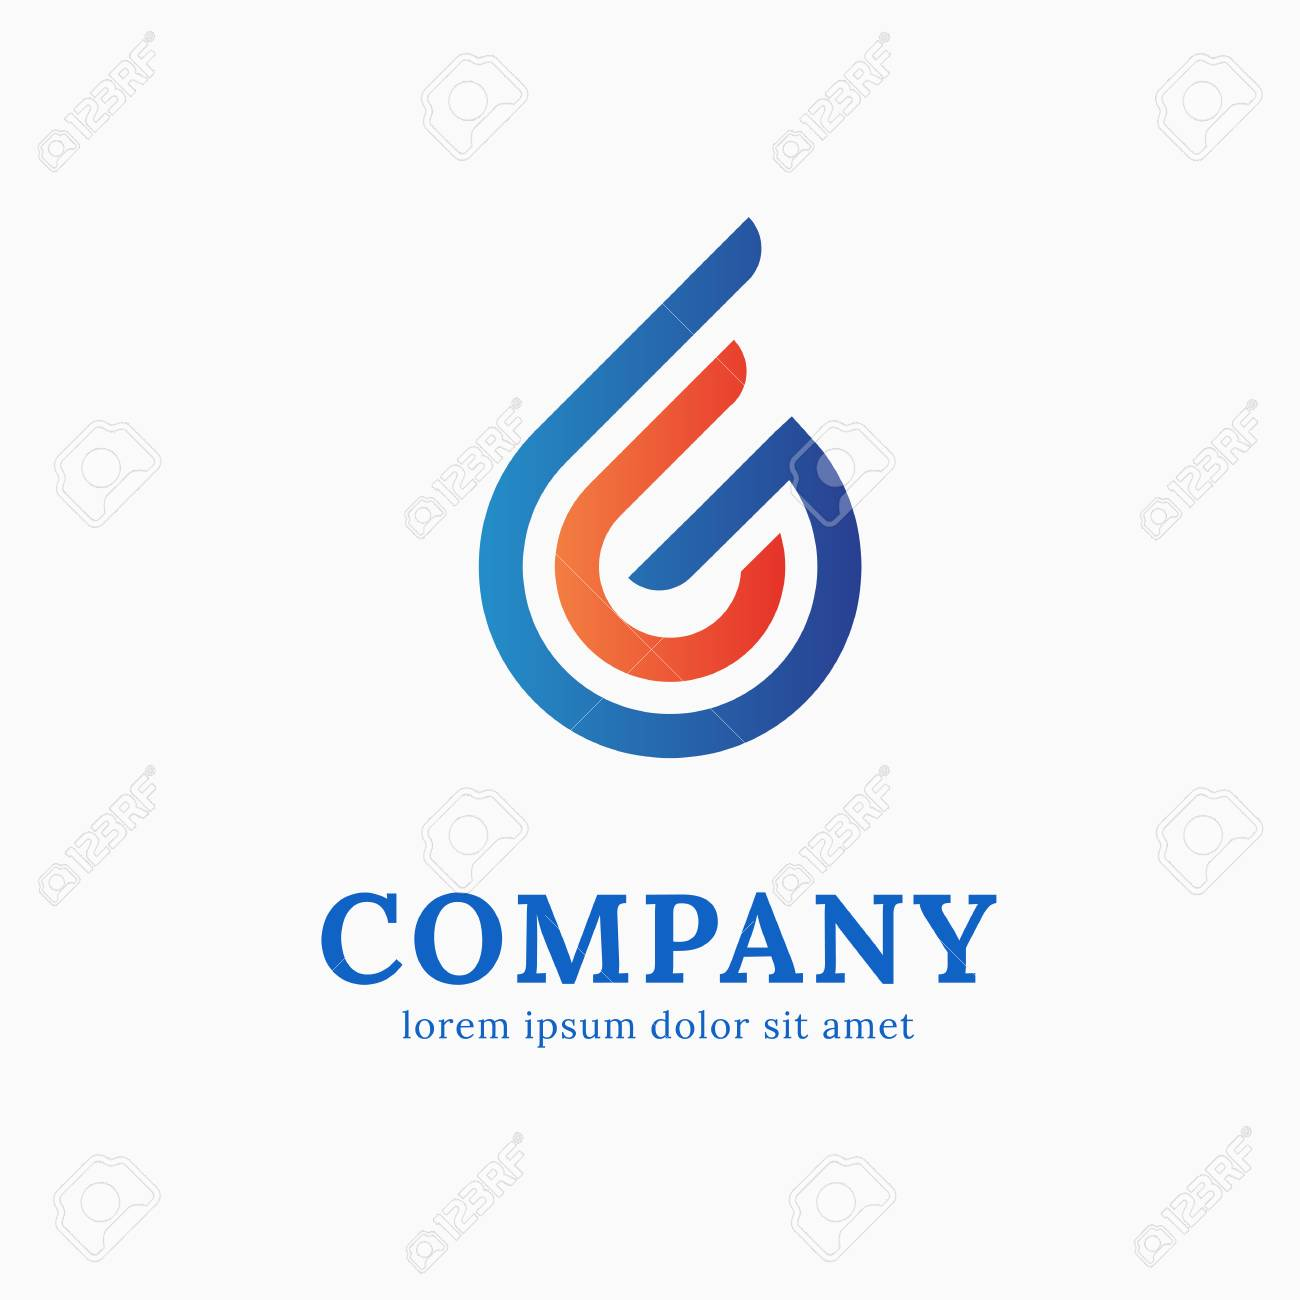 illustration design of simple geometry business flat symbol royalty